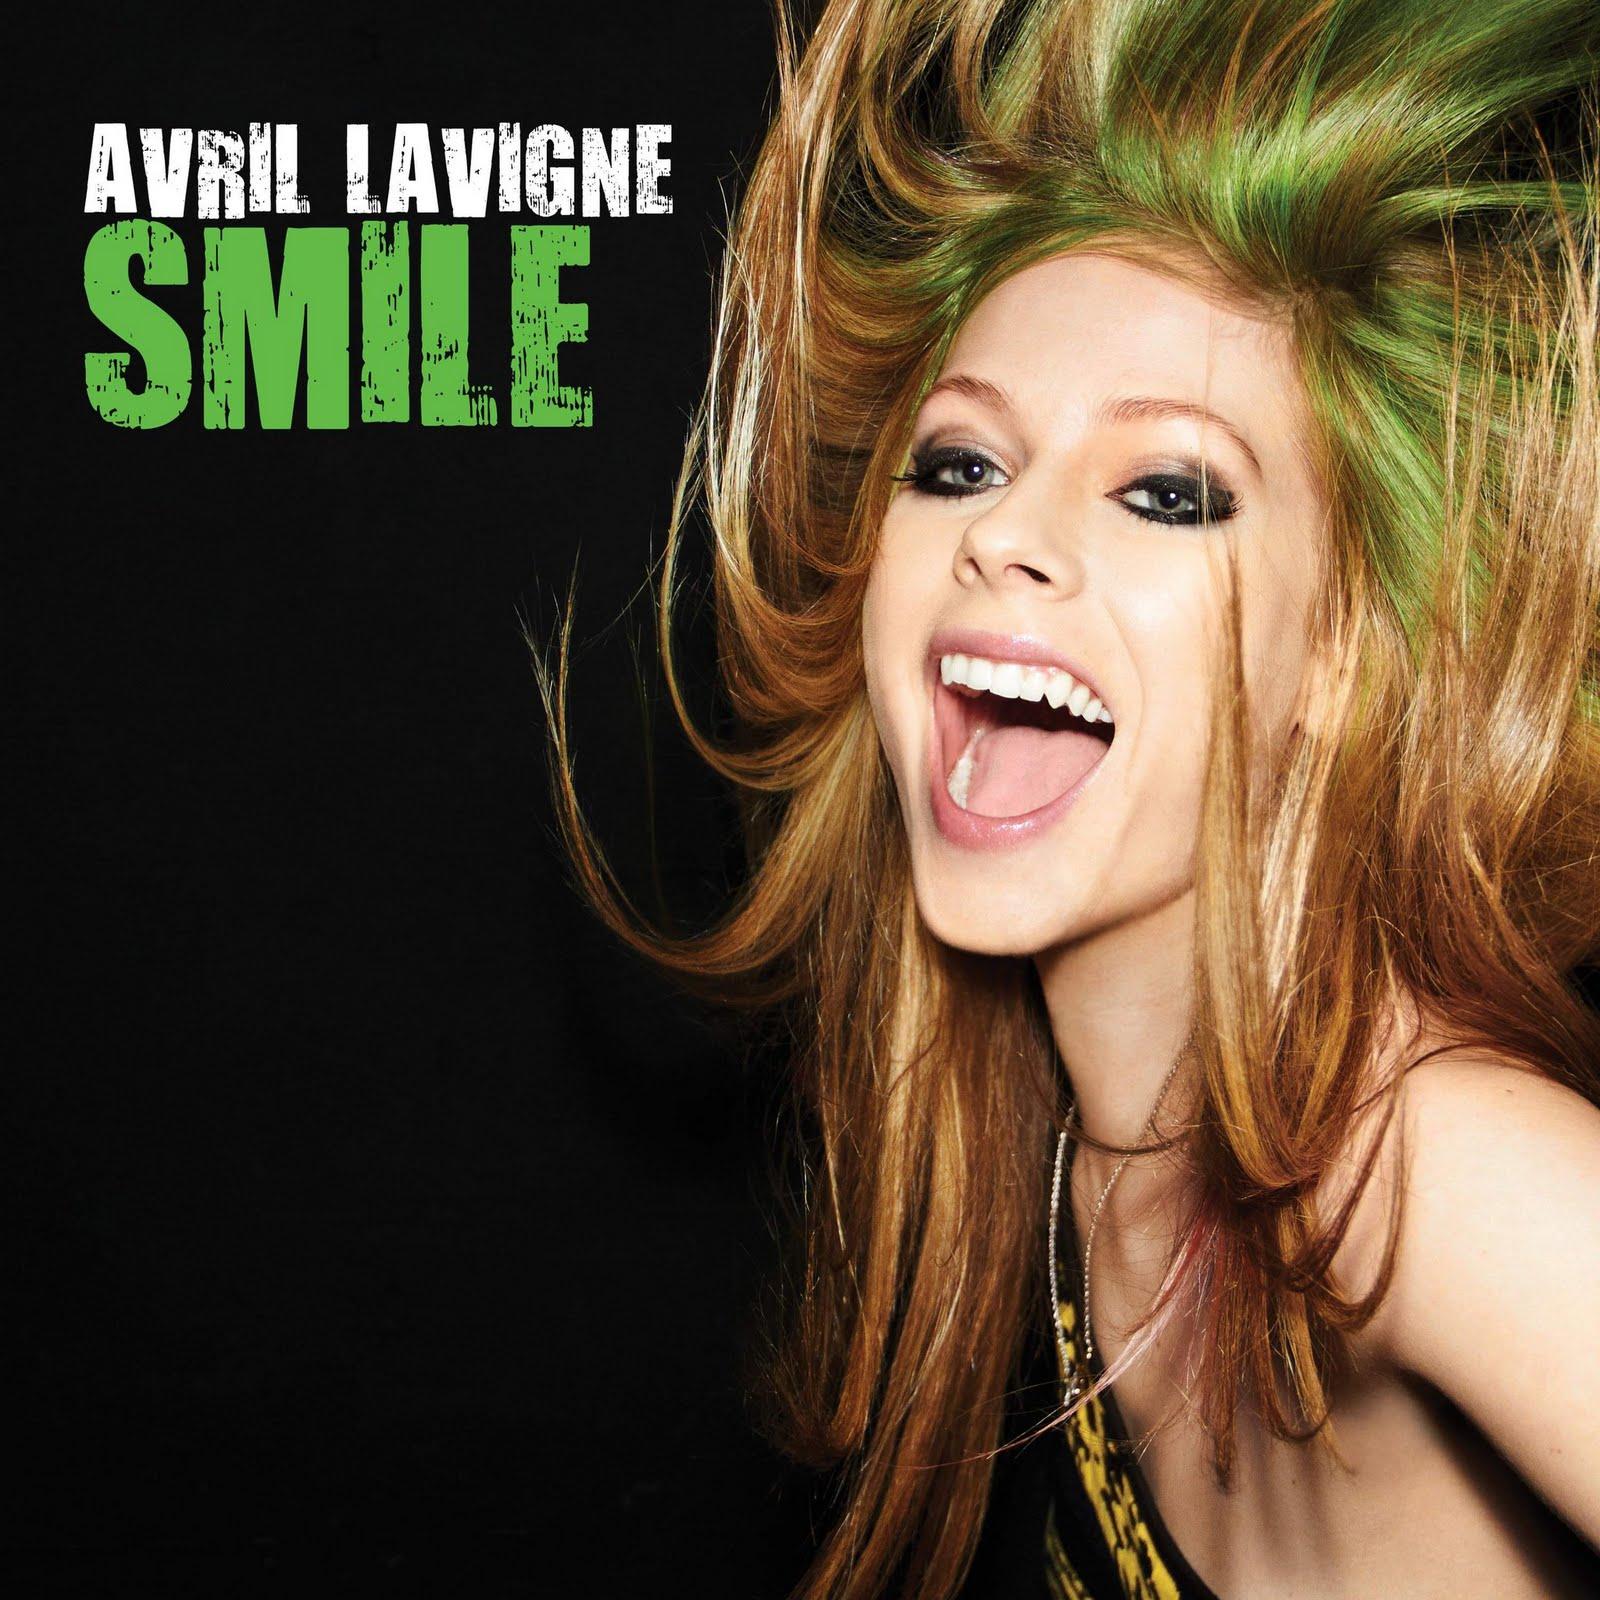 http://4.bp.blogspot.com/-zjHjN7Z6Mbw/TcviO0j2thI/AAAAAAAAA5M/gO155wD-Fbw/s1600/AvrilLavigne-Smile_cover.jpg